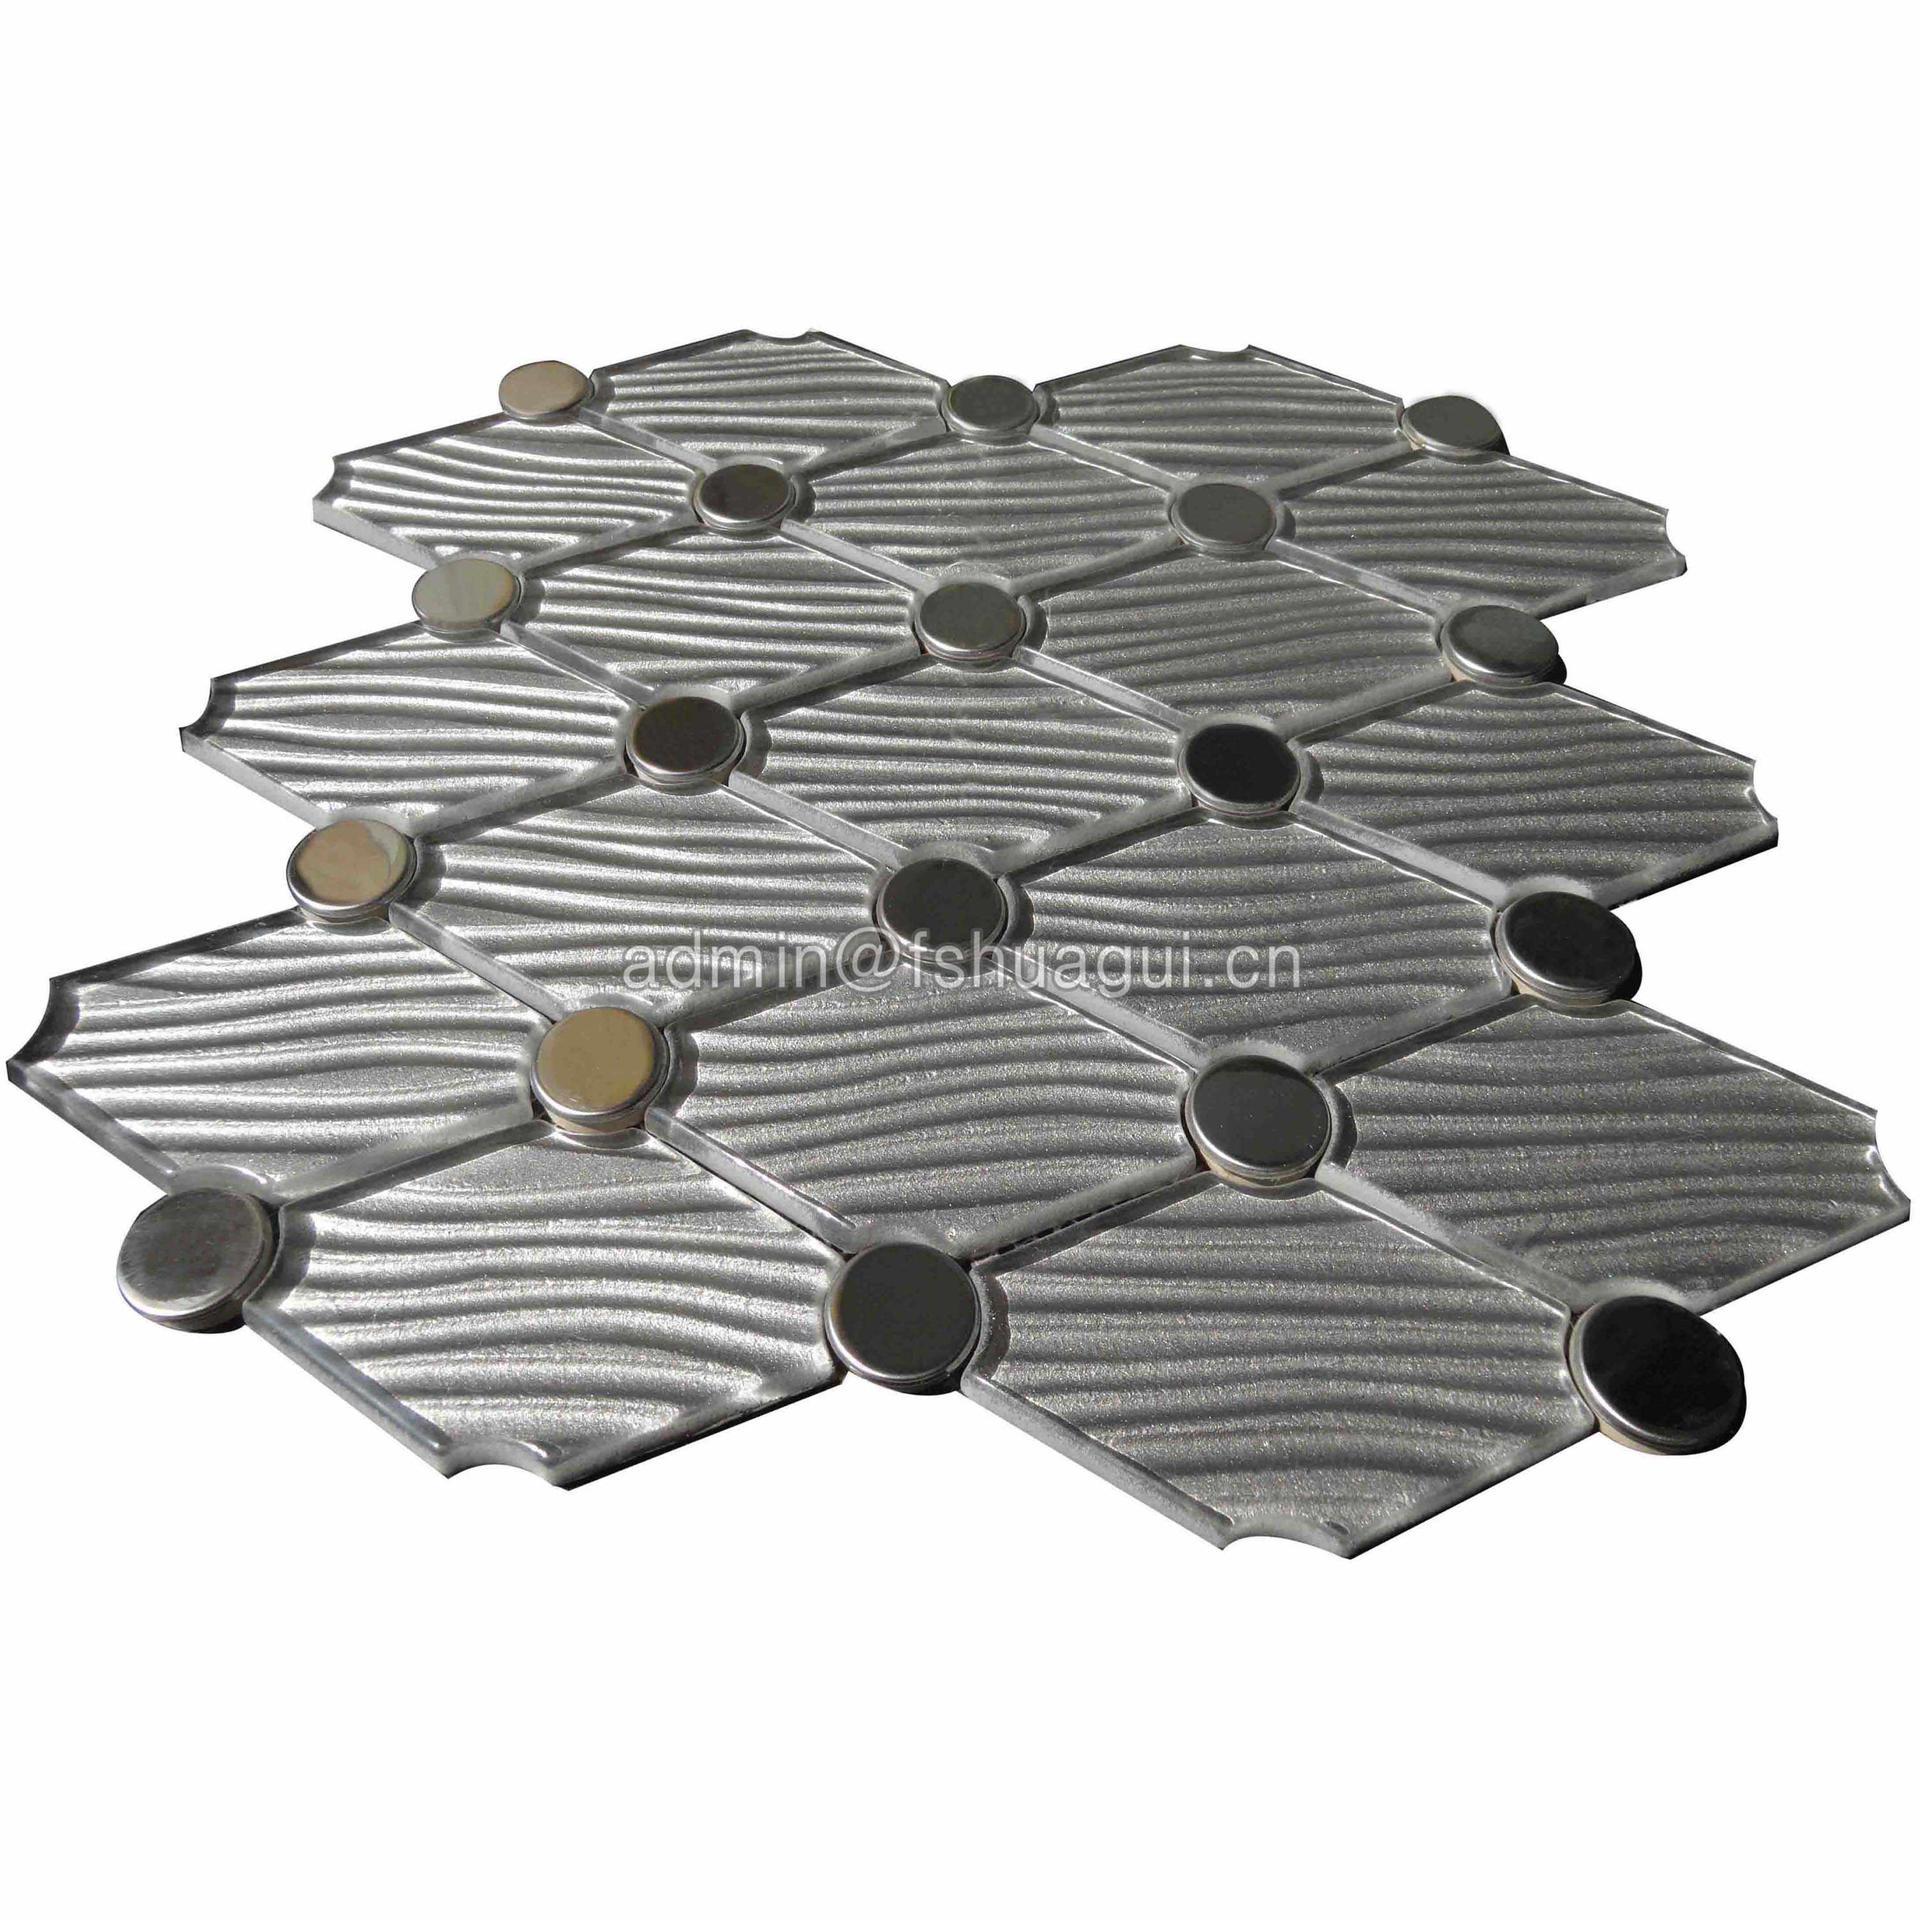 Interlocking diamond shape silver stainless with crystal texture water jet mosaic backsplash